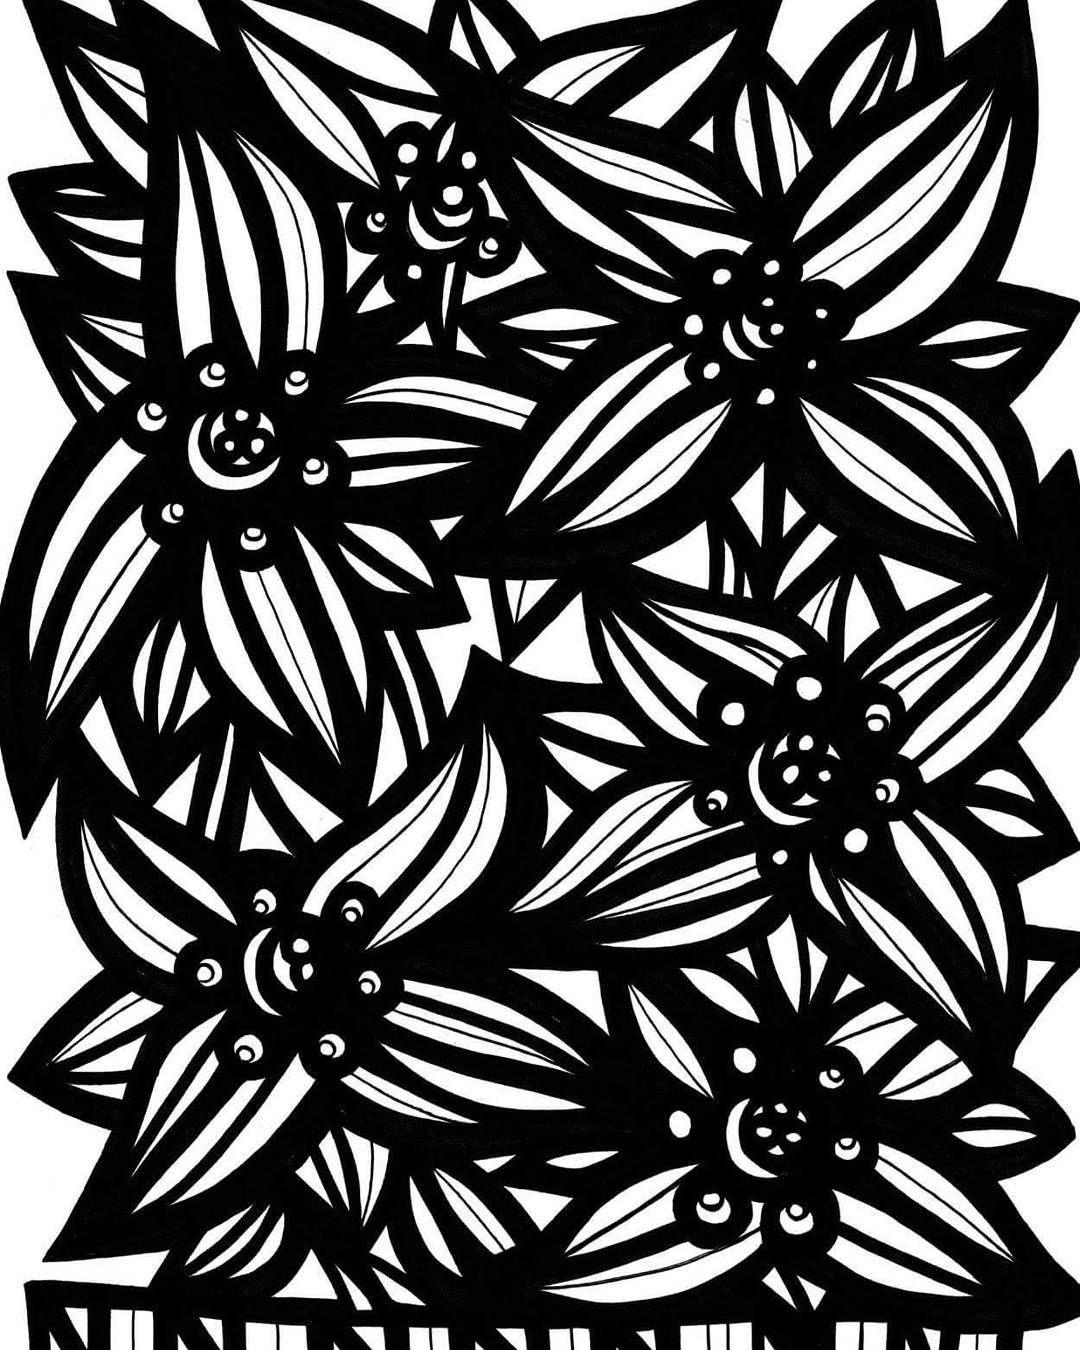 Botanical art coloring book -  Flower Flowers Floral Nature Botanical Art Arts Artist